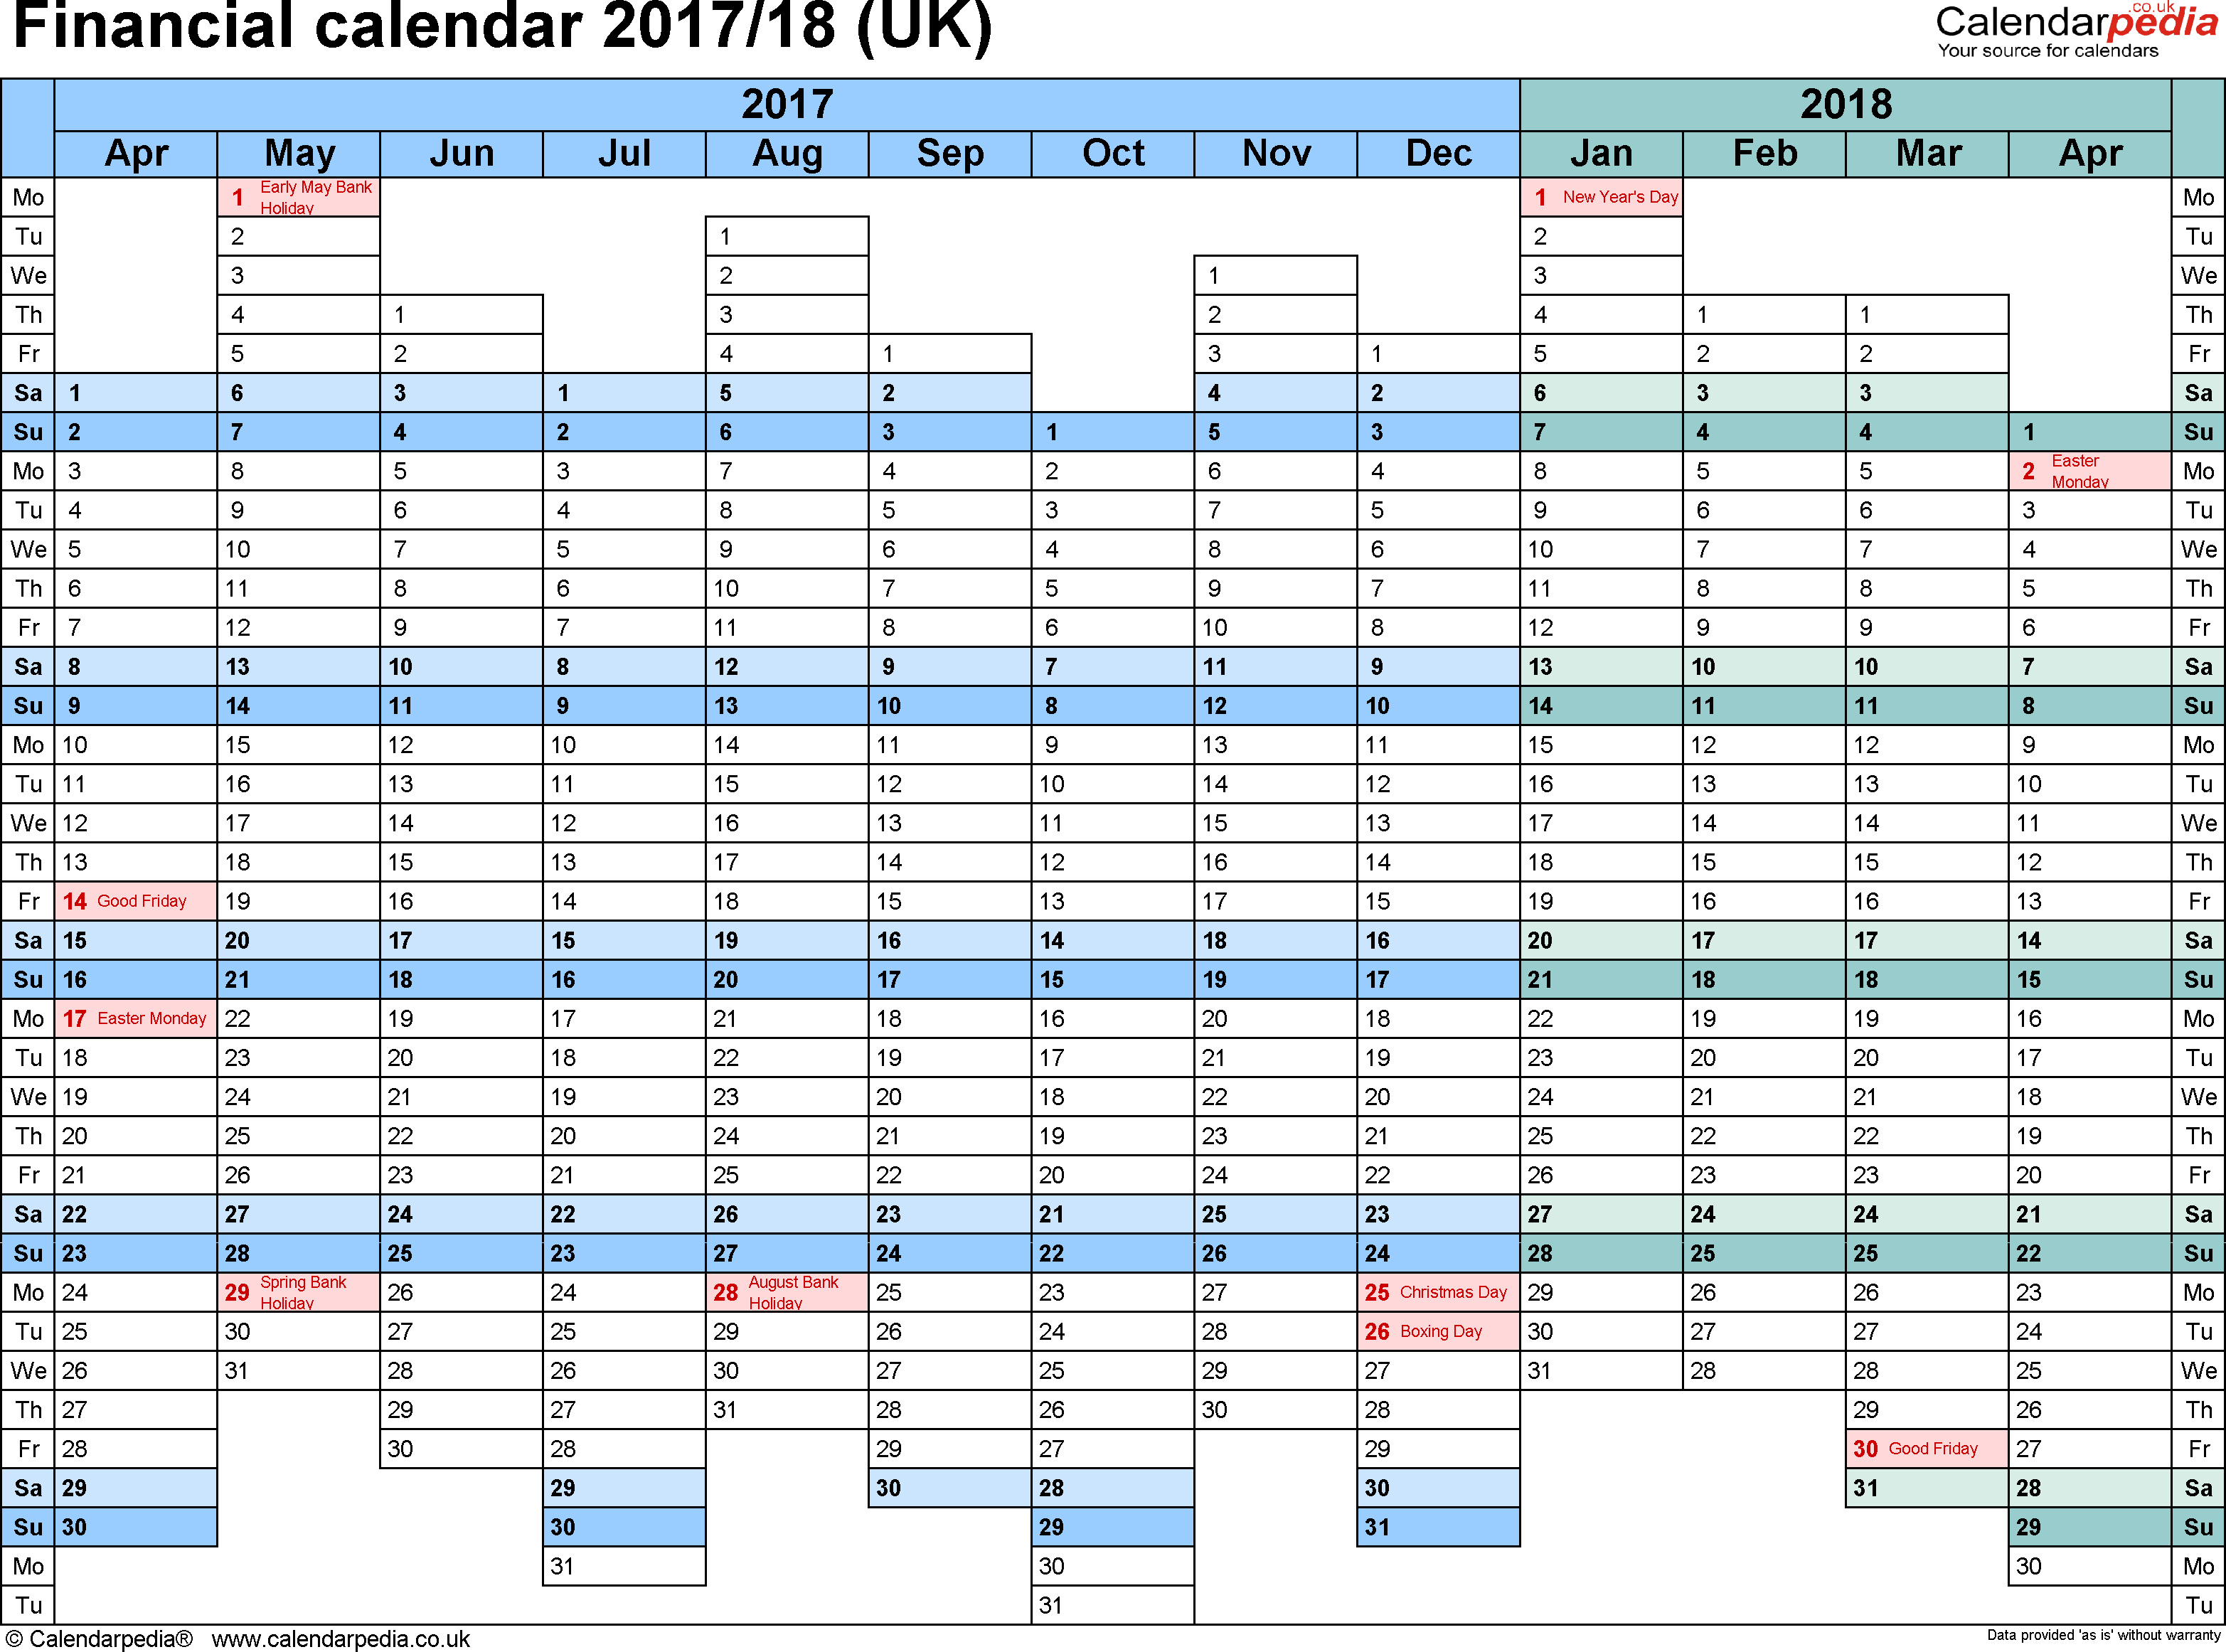 Financial Calendars 2017/18 (Uk) In Pdf Format With Regard